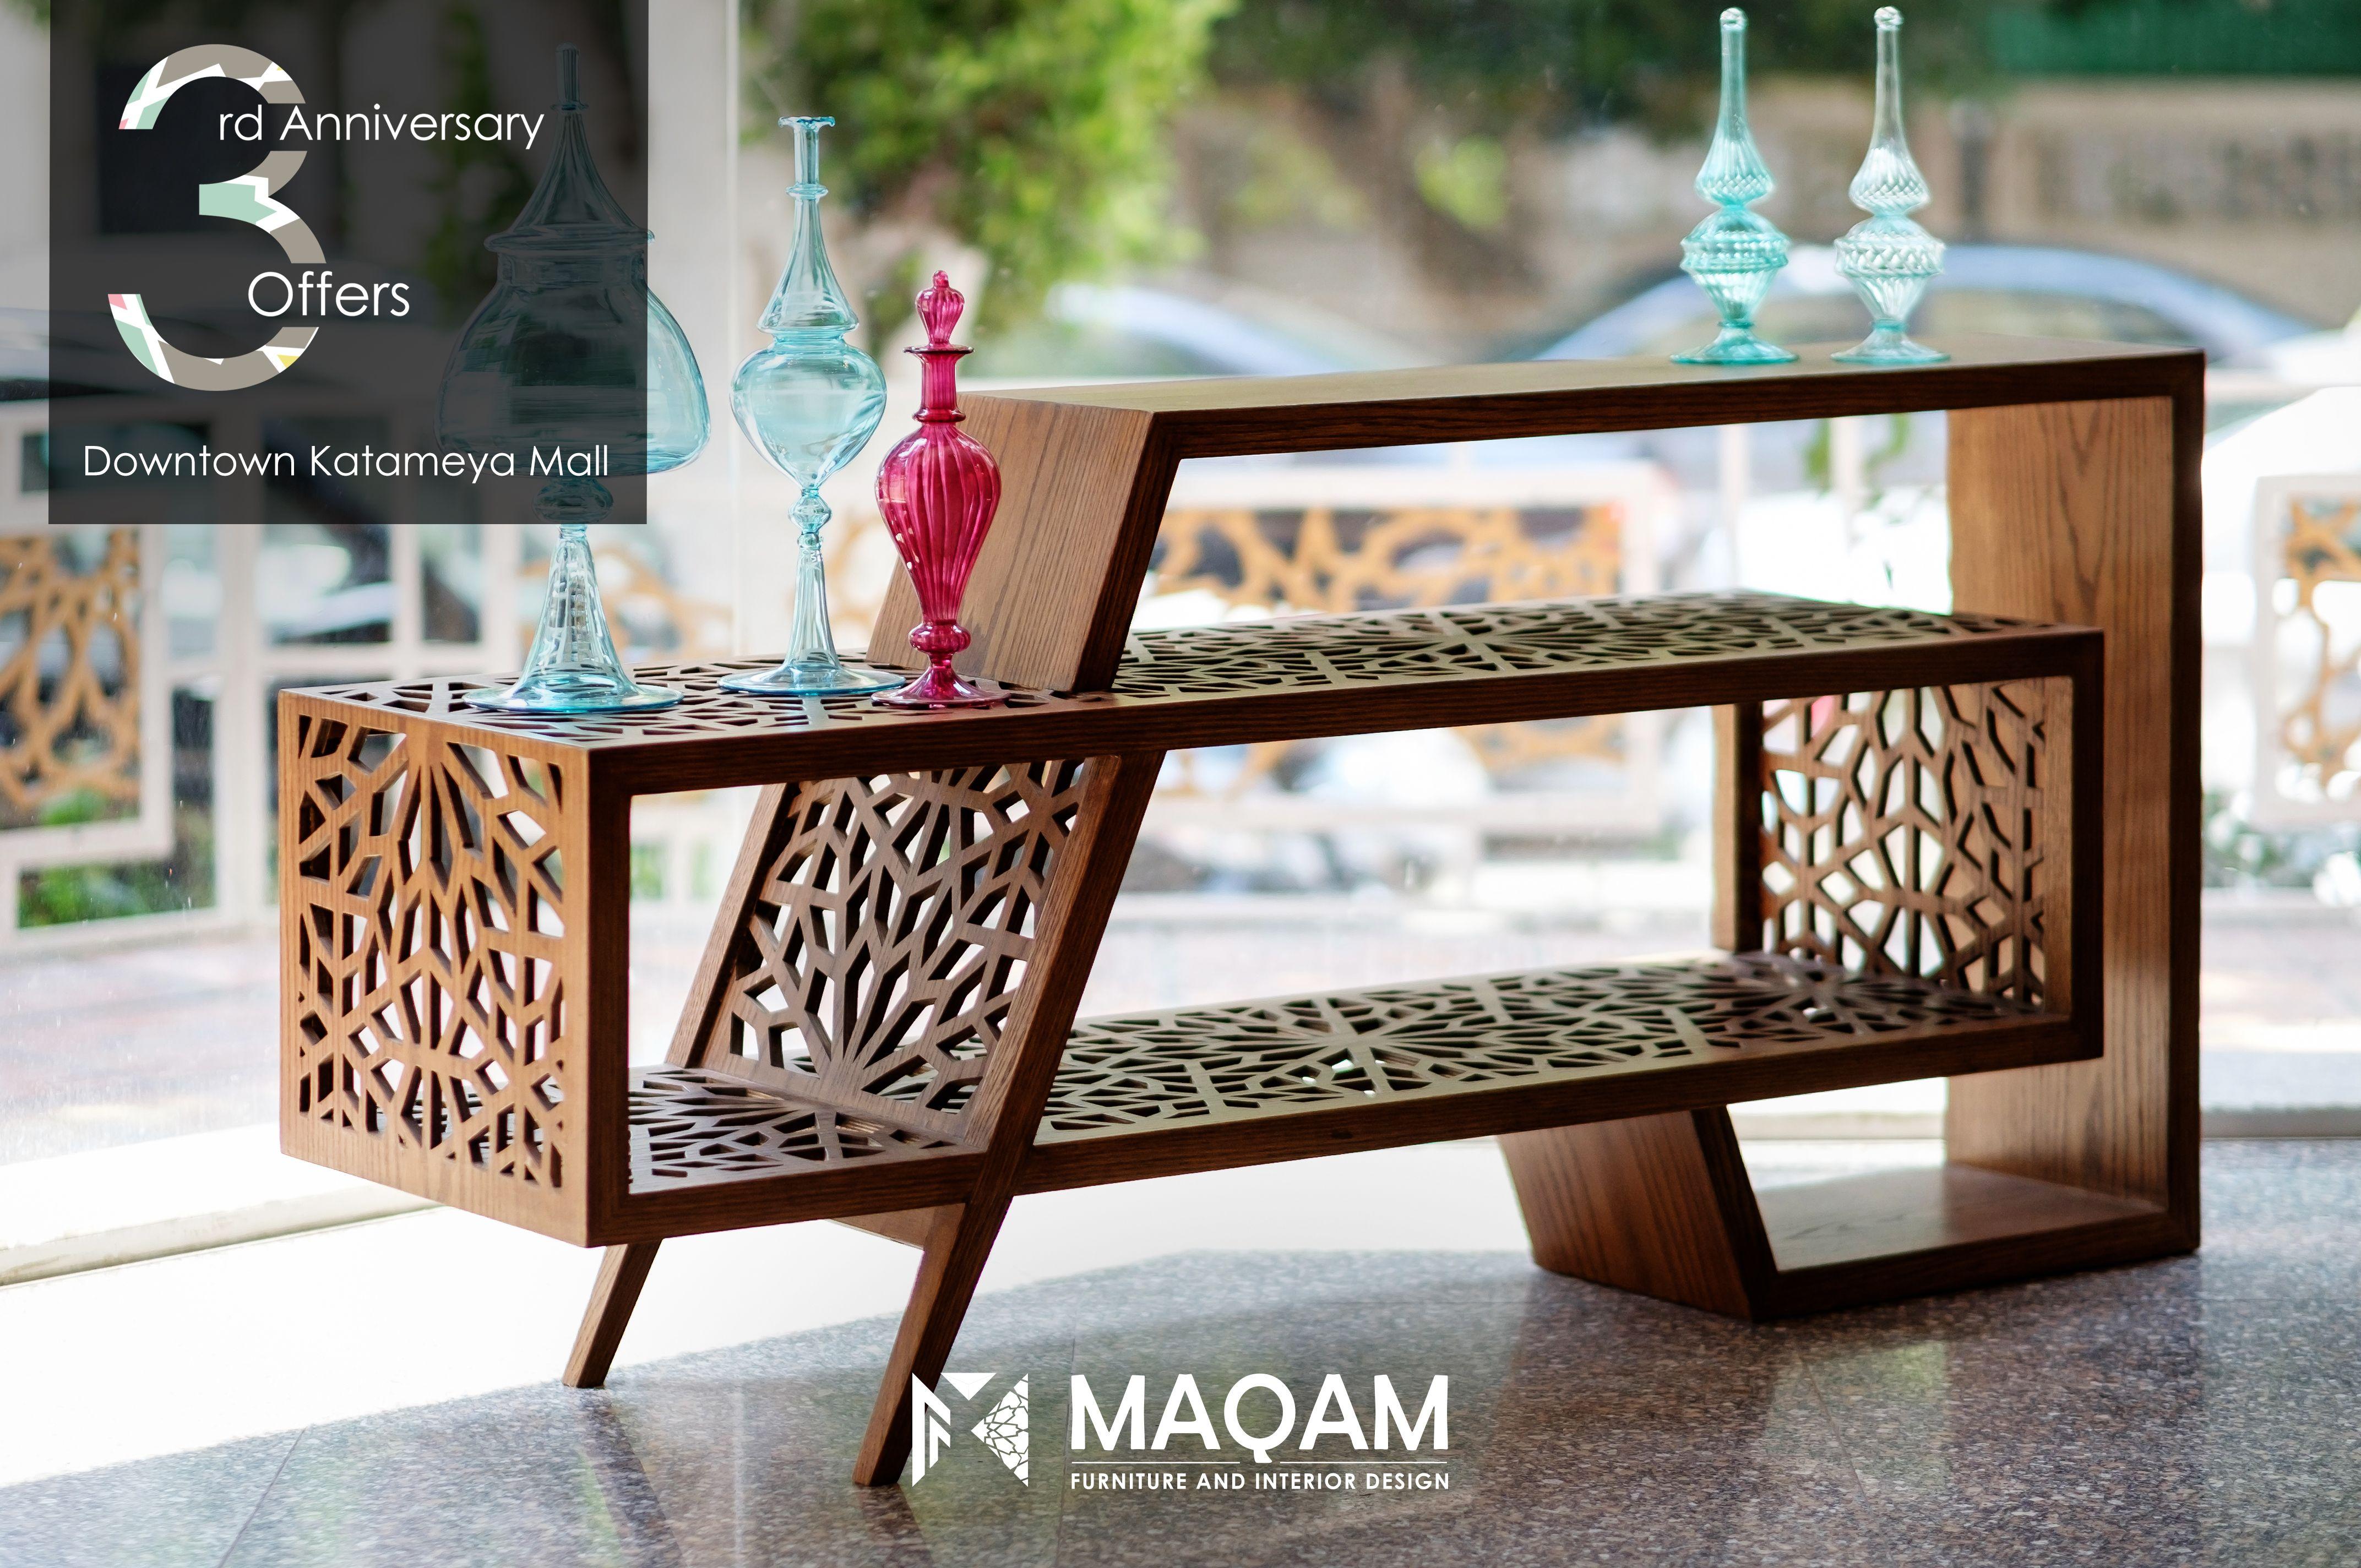 Pin By Hasan Hosgor On Ahsap Isciligi Home Decor Furniture